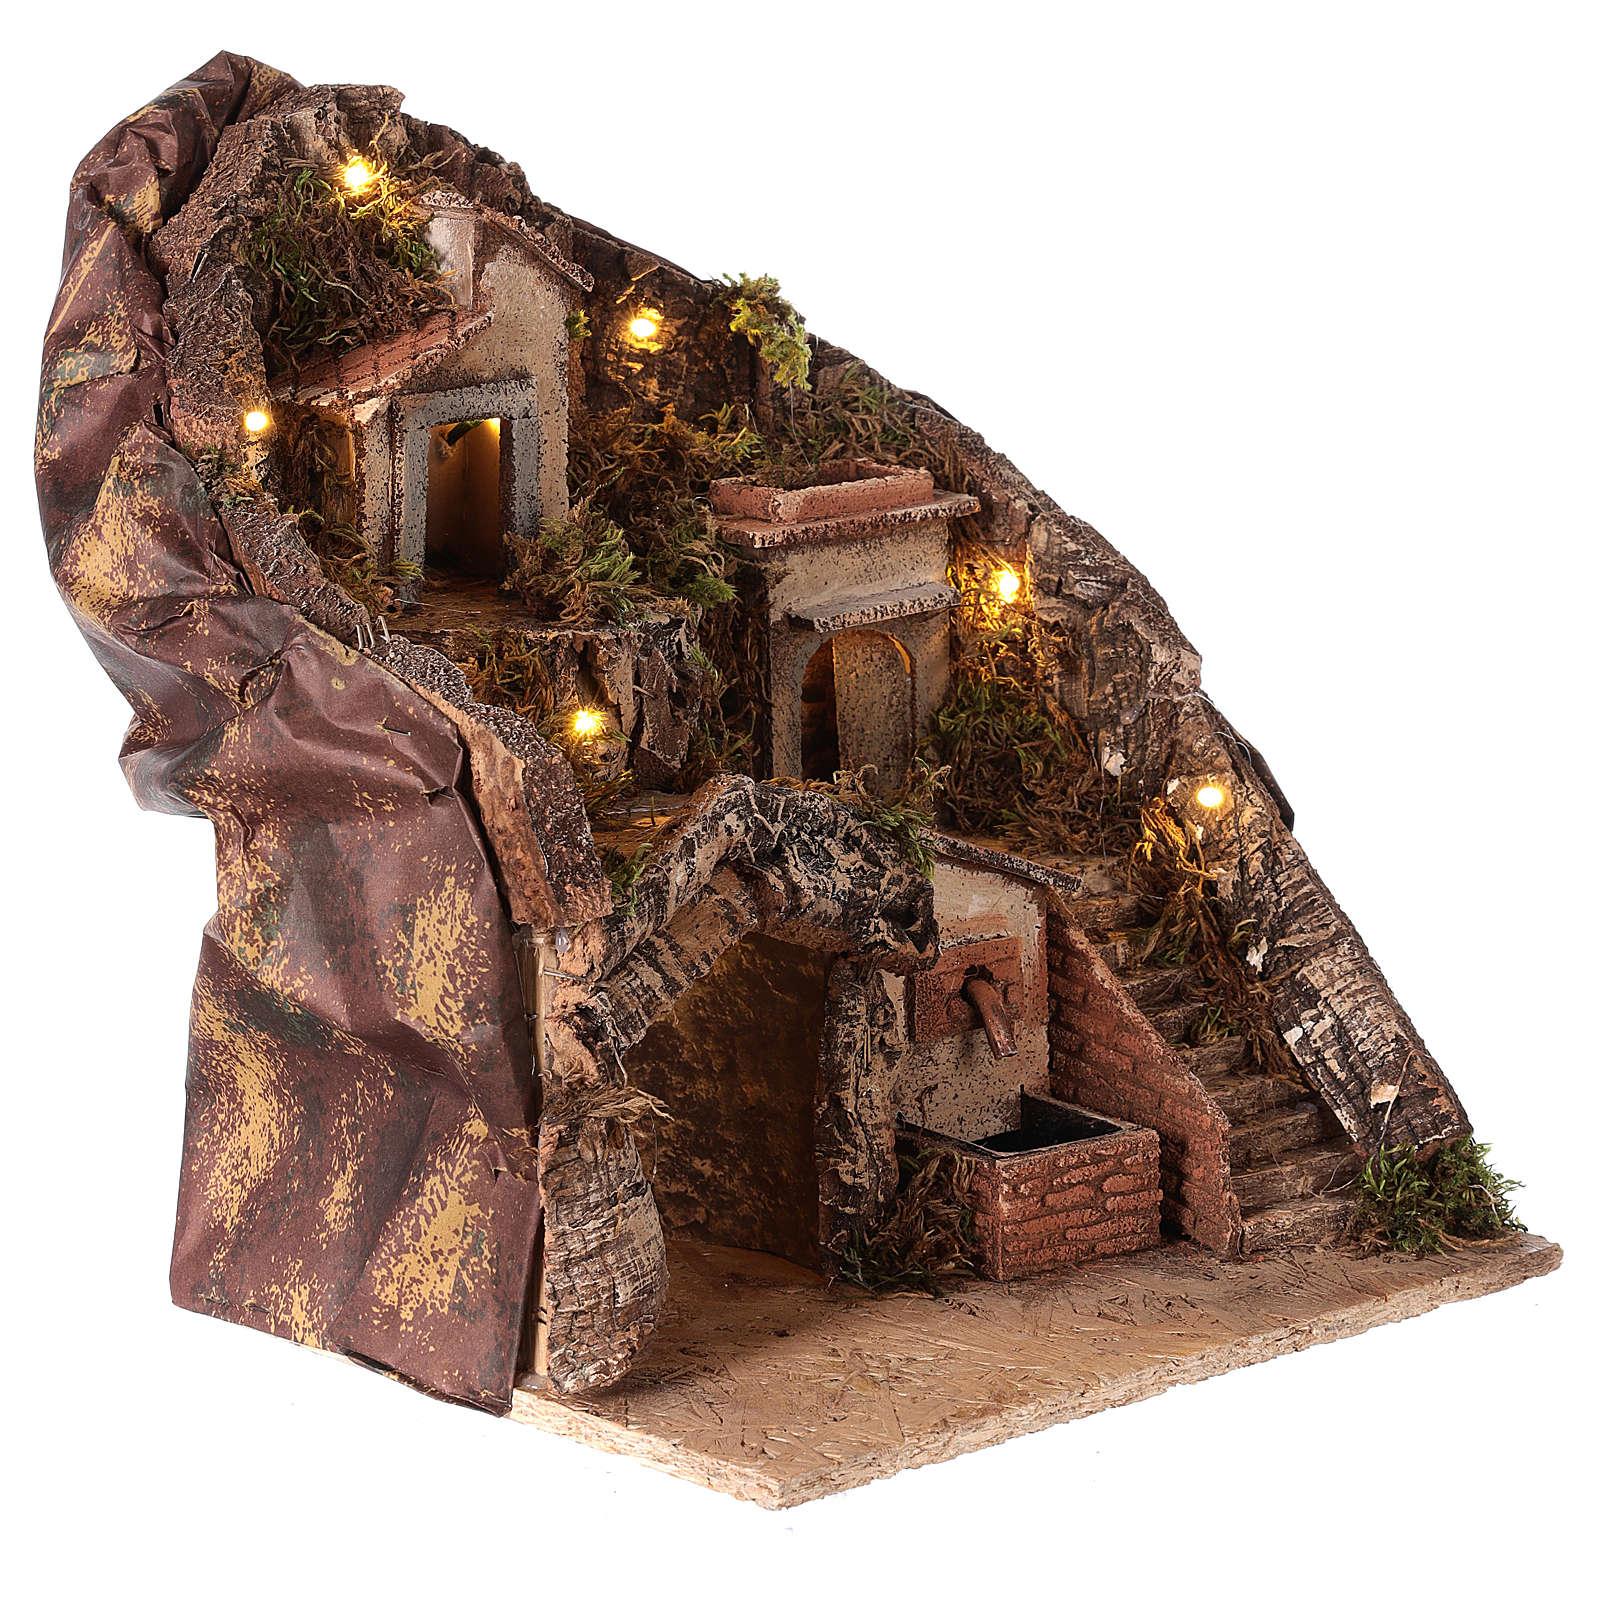 Hamlet for Neapolitan Nativity Scene with fountain and lights 35x30x30 cm 4